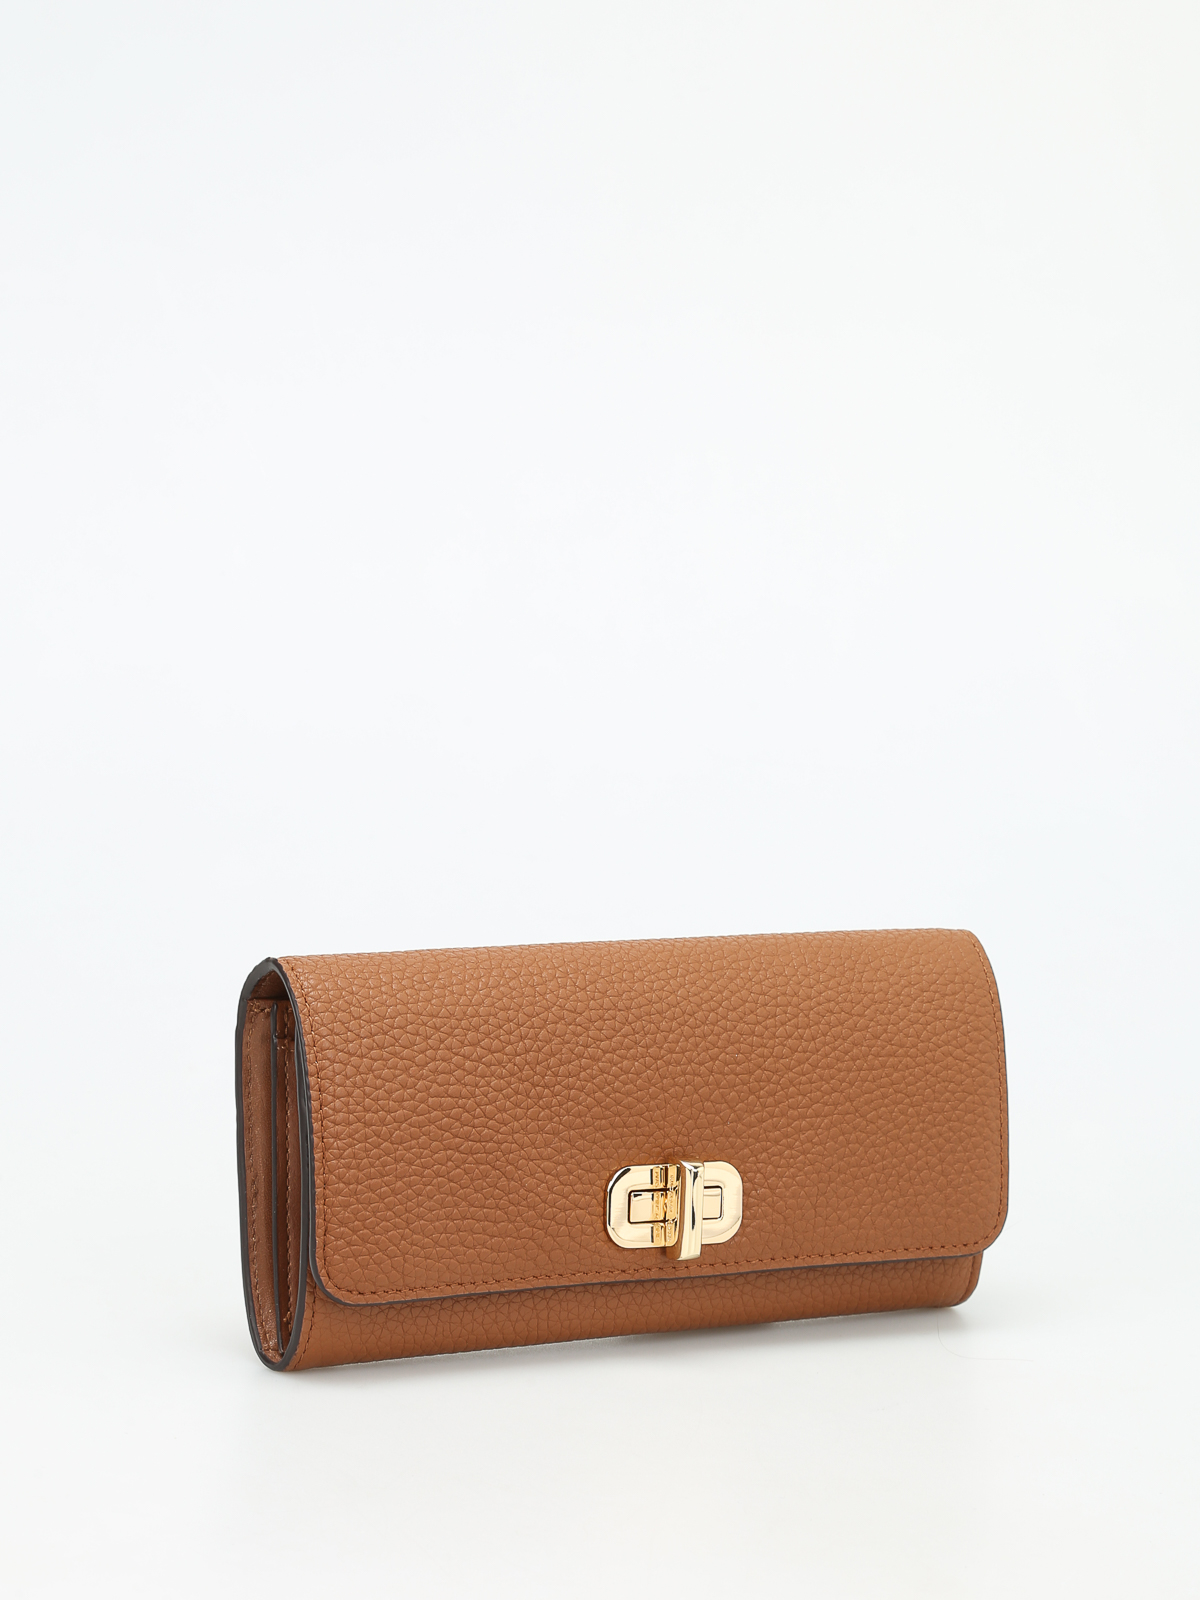 04cbfa9ed7f486 ... shopping michael kors wallets purses online sullivan large wallet c6076  ee5c9 ...